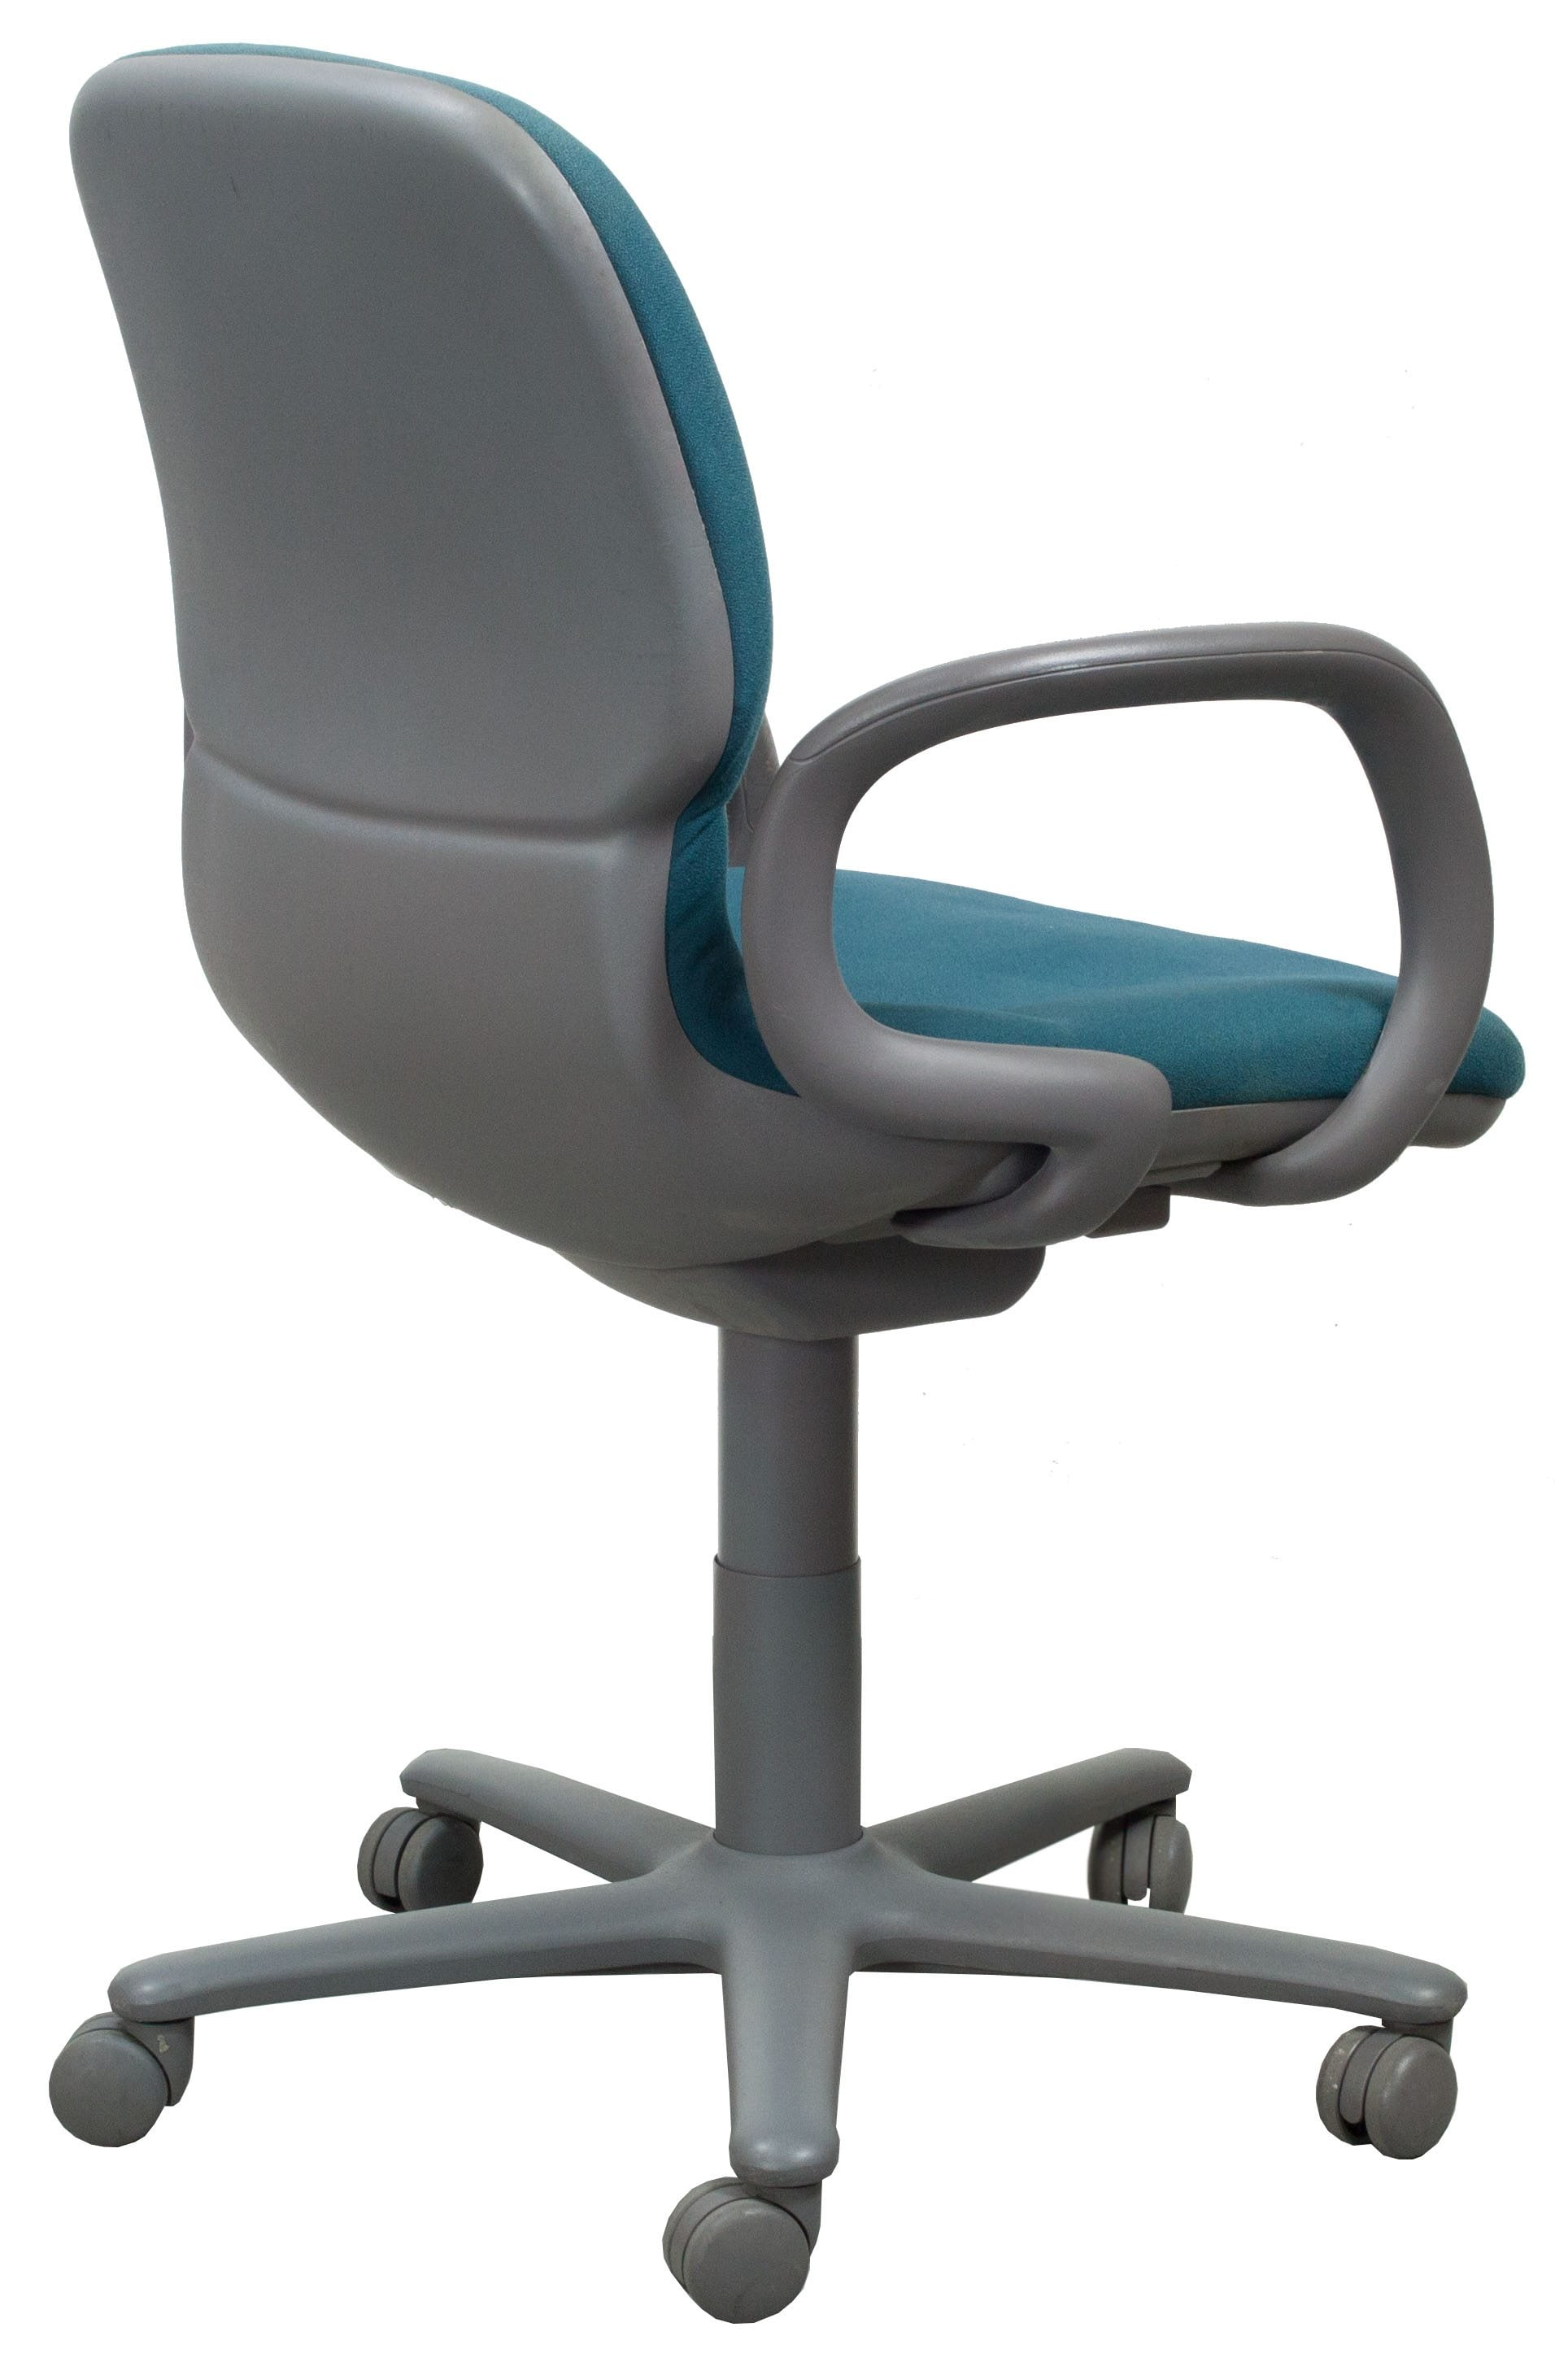 teal office chair tri fold beach steelcase sensor used mid back task national